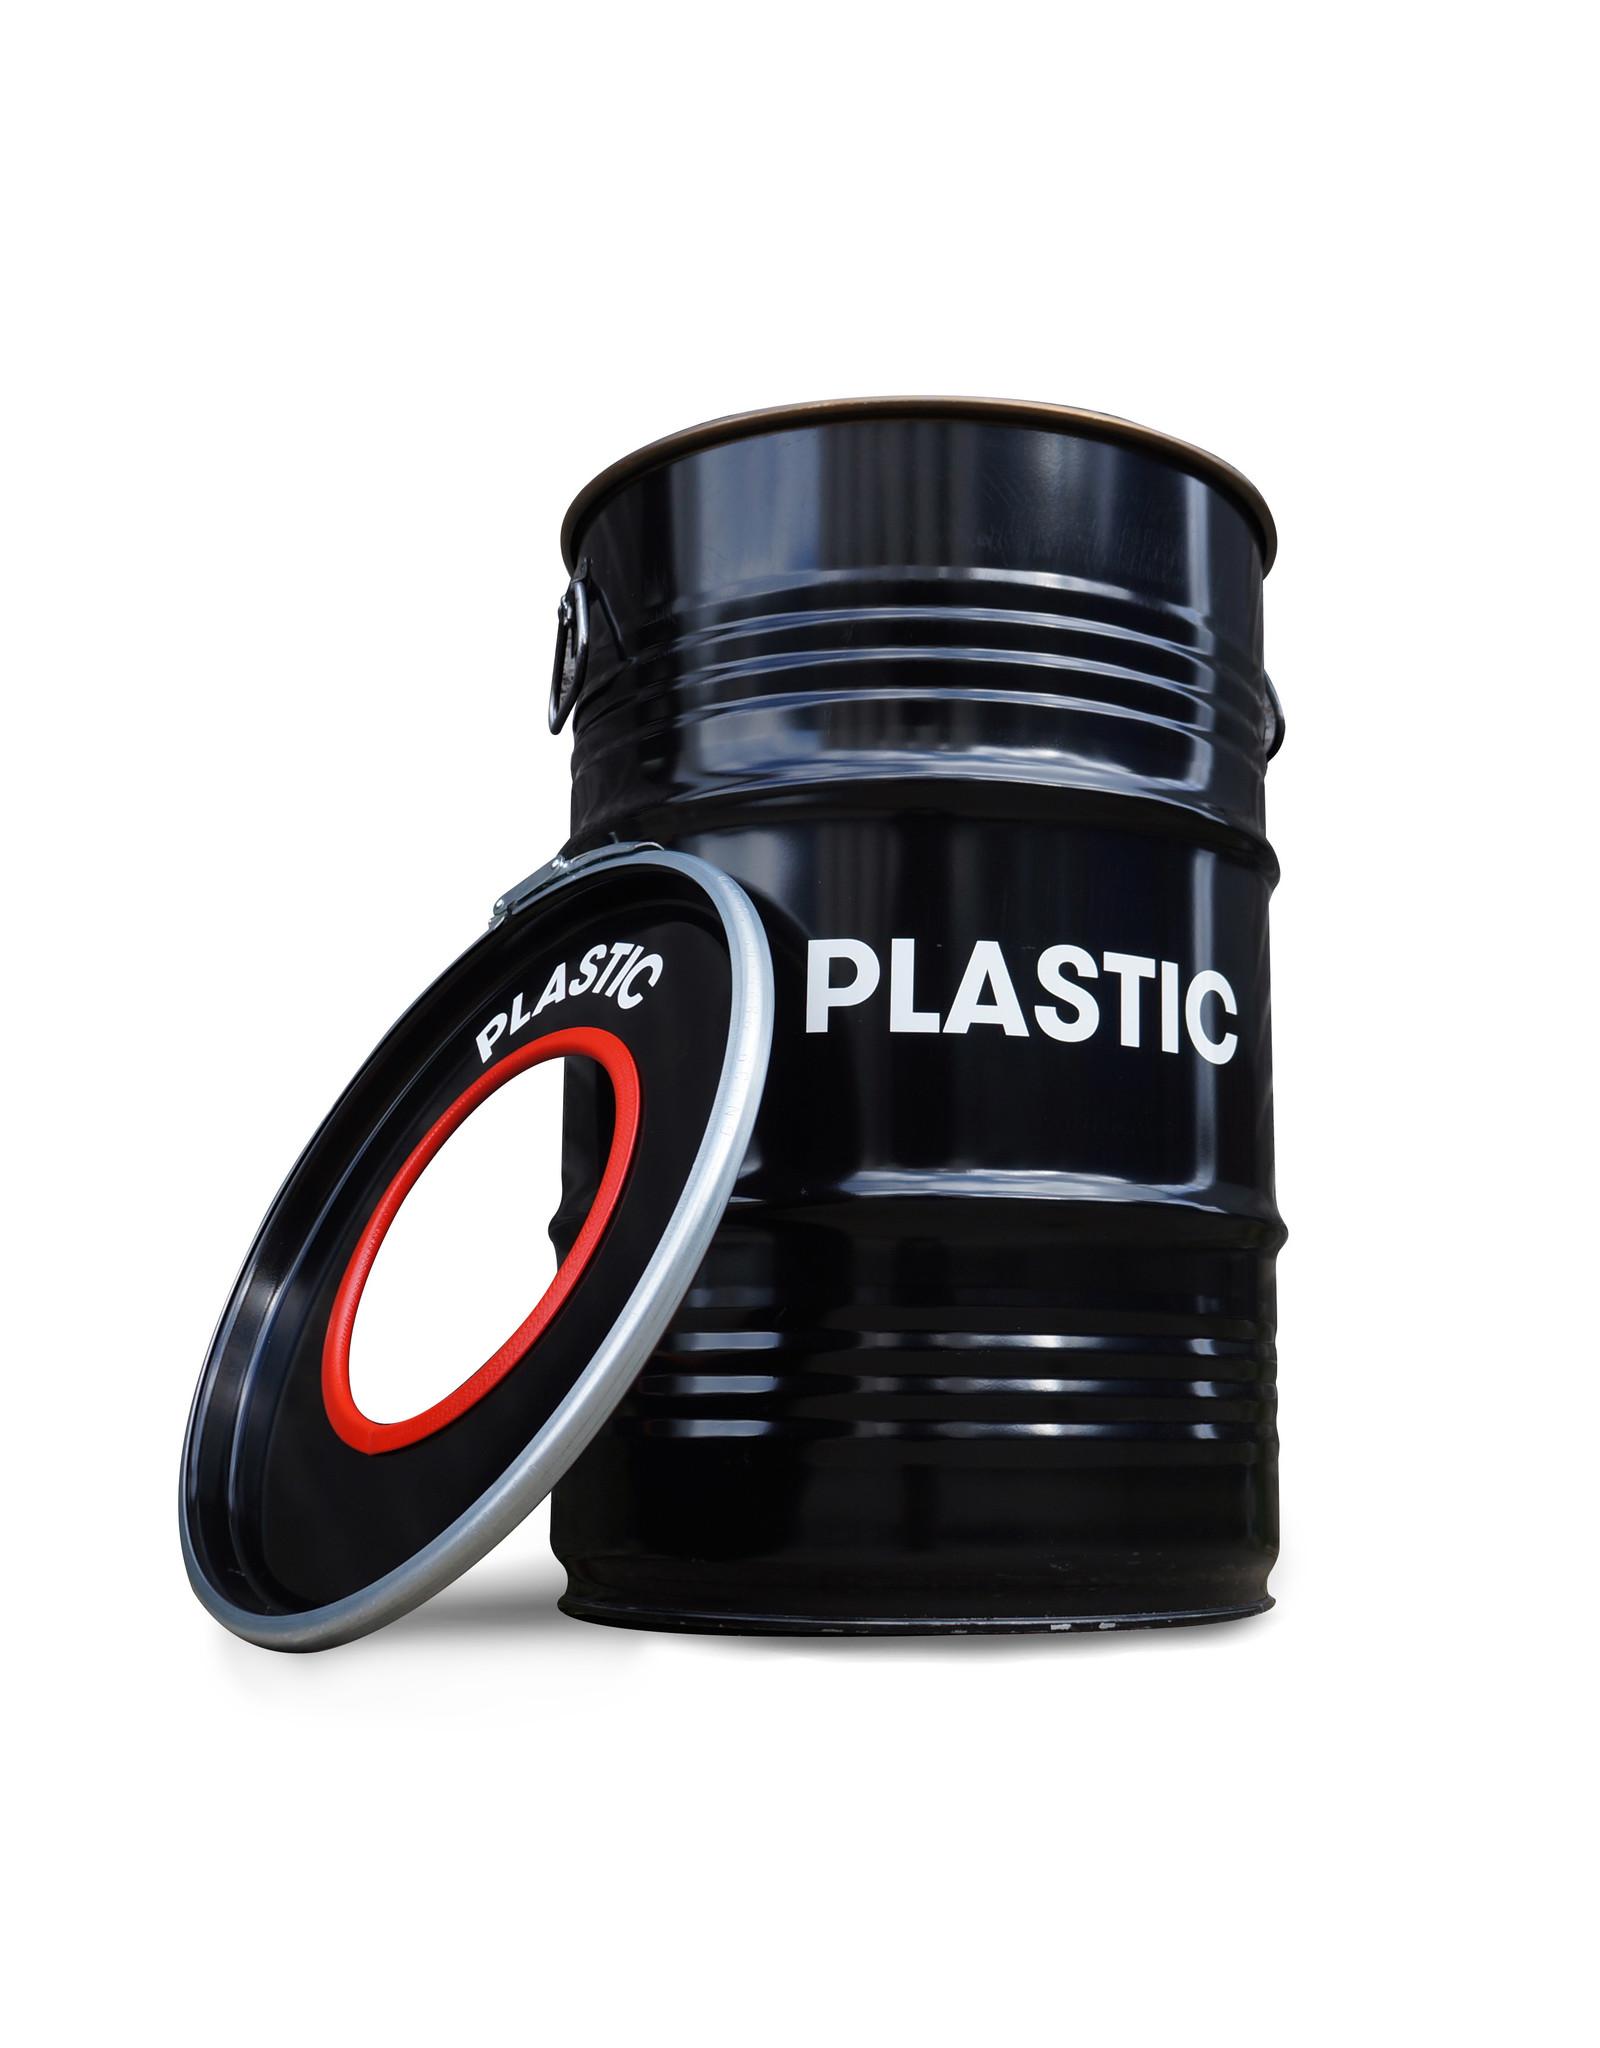 Barrelkings BinBin Hole Plastik industrieller Mülleimer Abfalltrennung 60 Liter Ölfass für Kunststoffabfälle